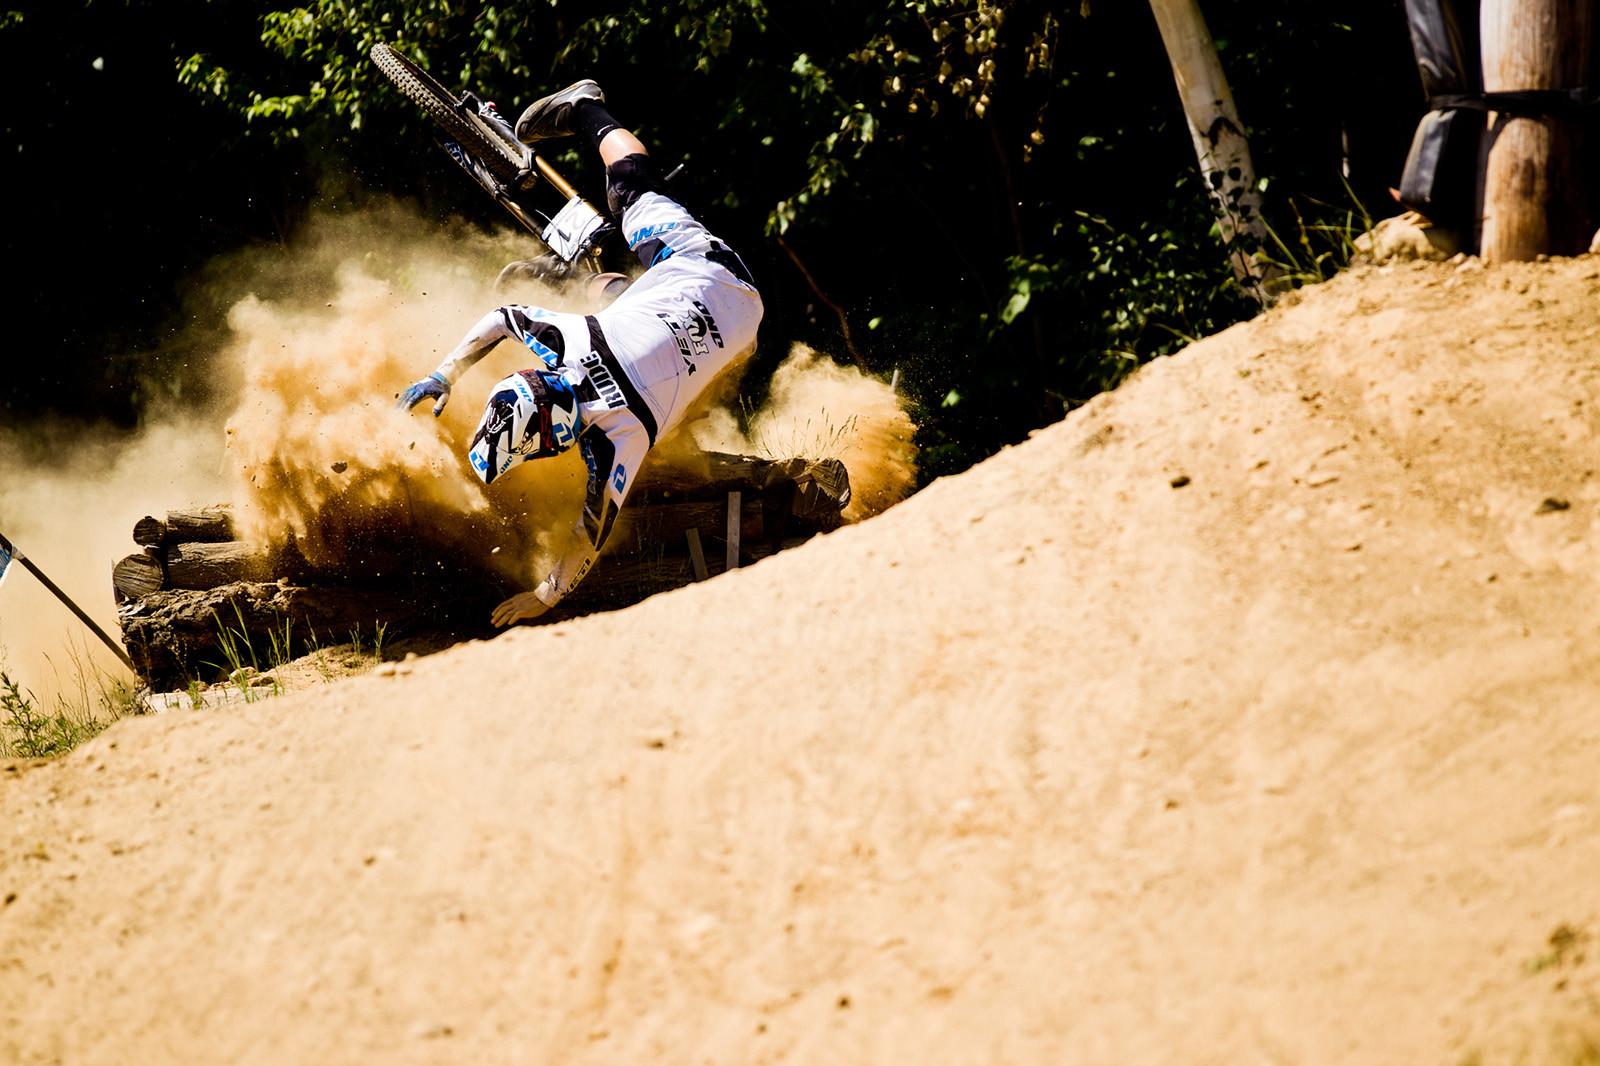 Rude Awakening at Mont Sainte Anne - 2012 UCI World Cup, Mont Sainte Anne, Day 2 - Mountain Biking Pictures - Vital MTB